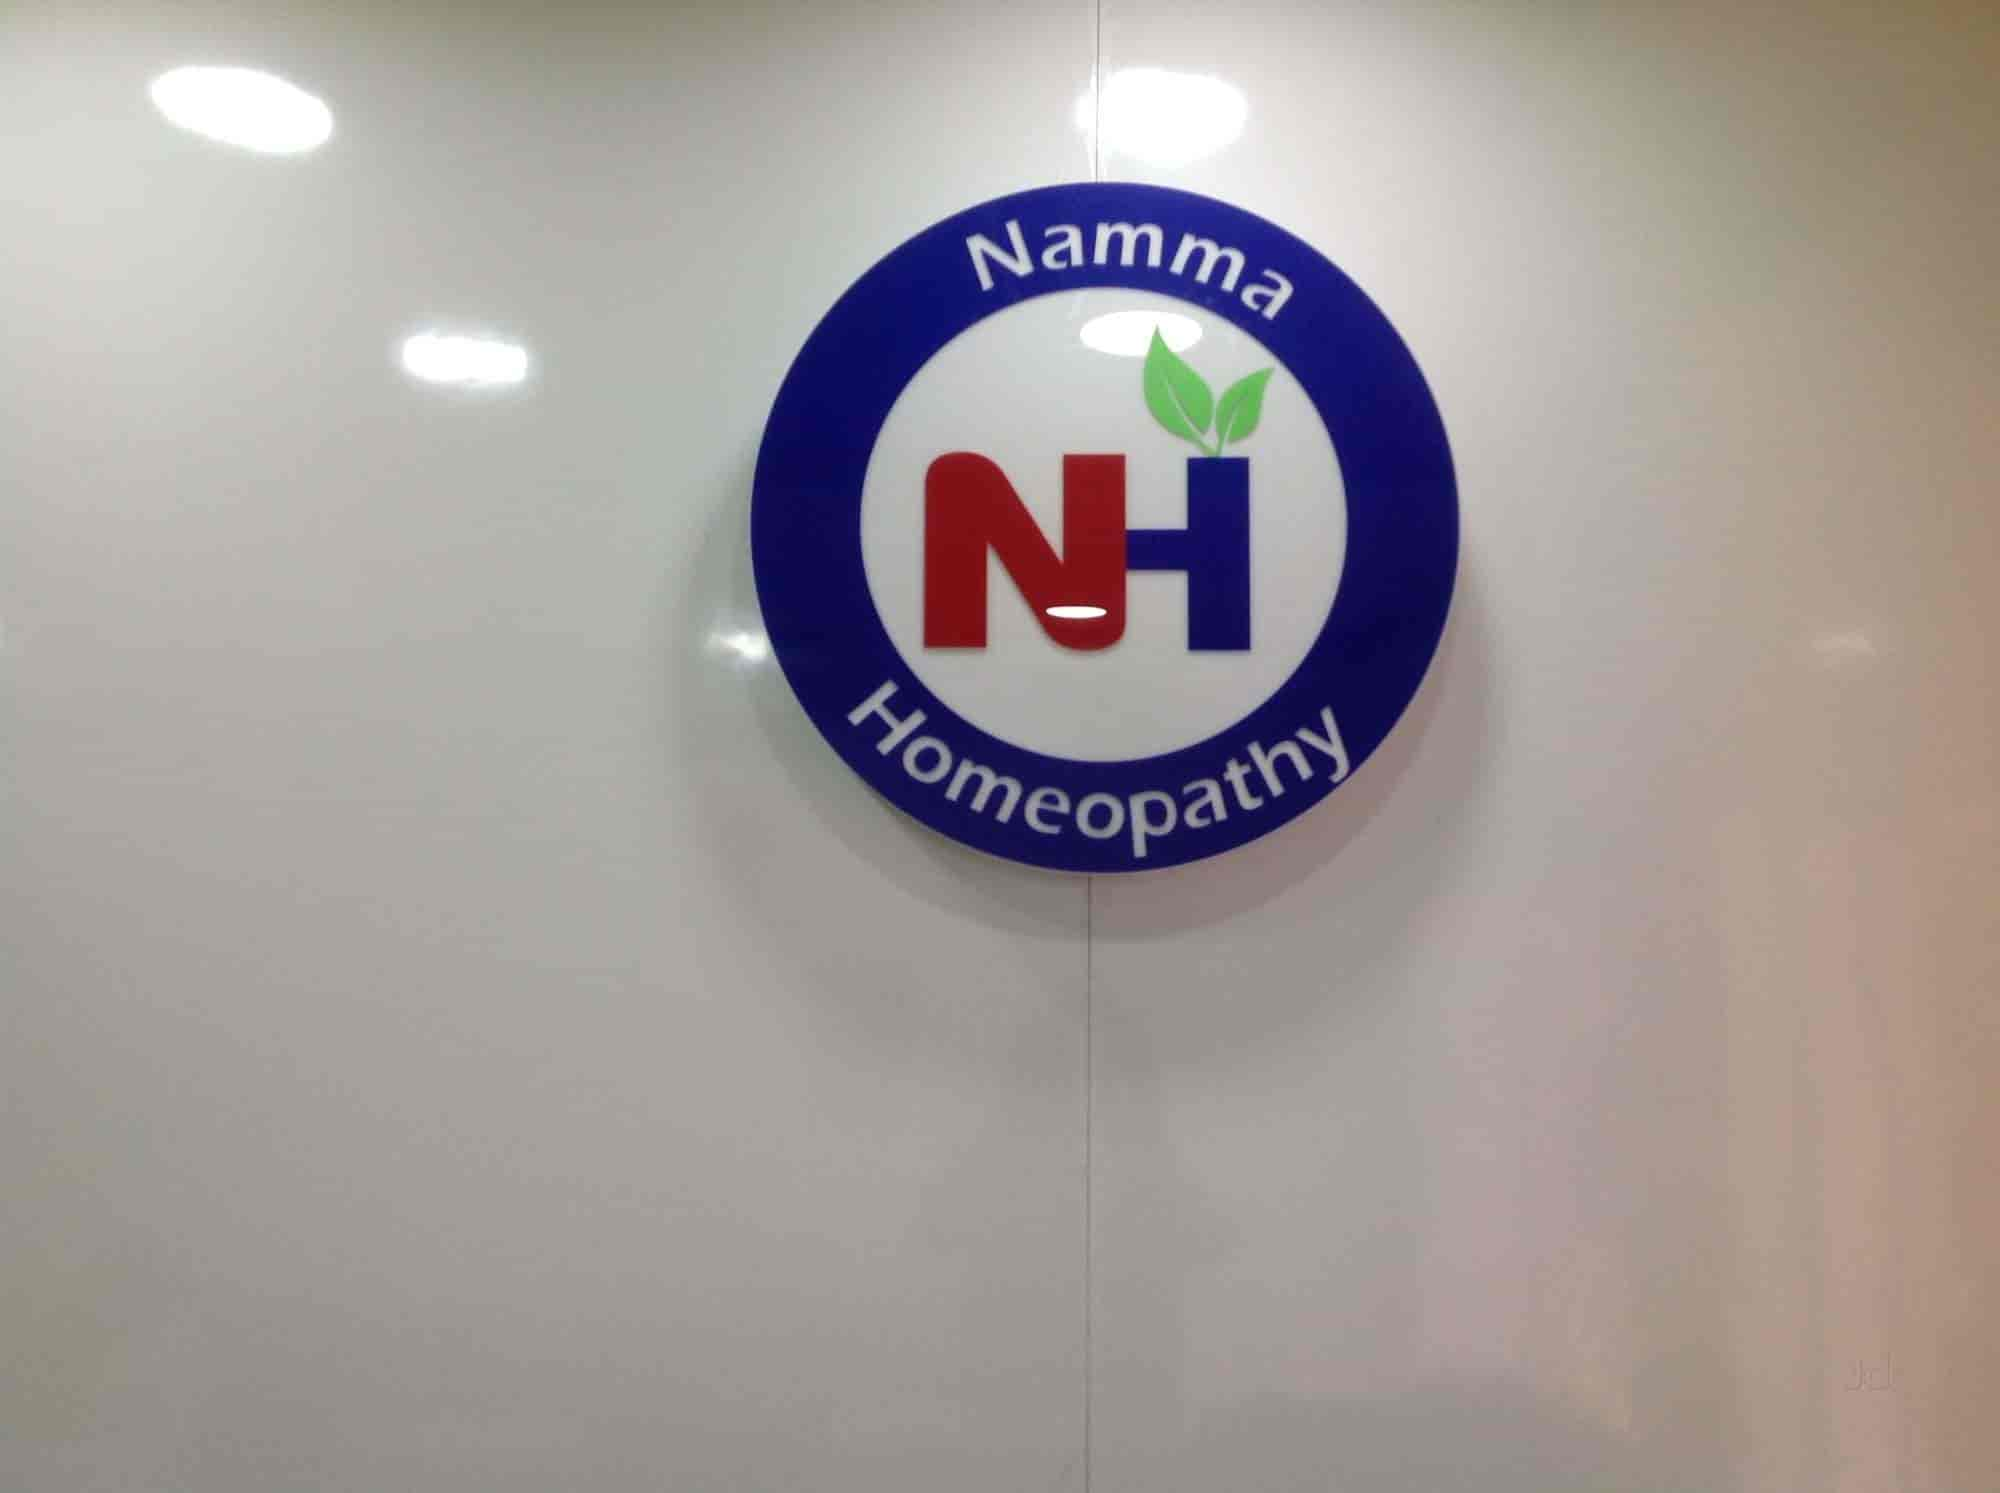 Namma Homeopathy Malleswaram Namma Homoeopathy Homeopathic